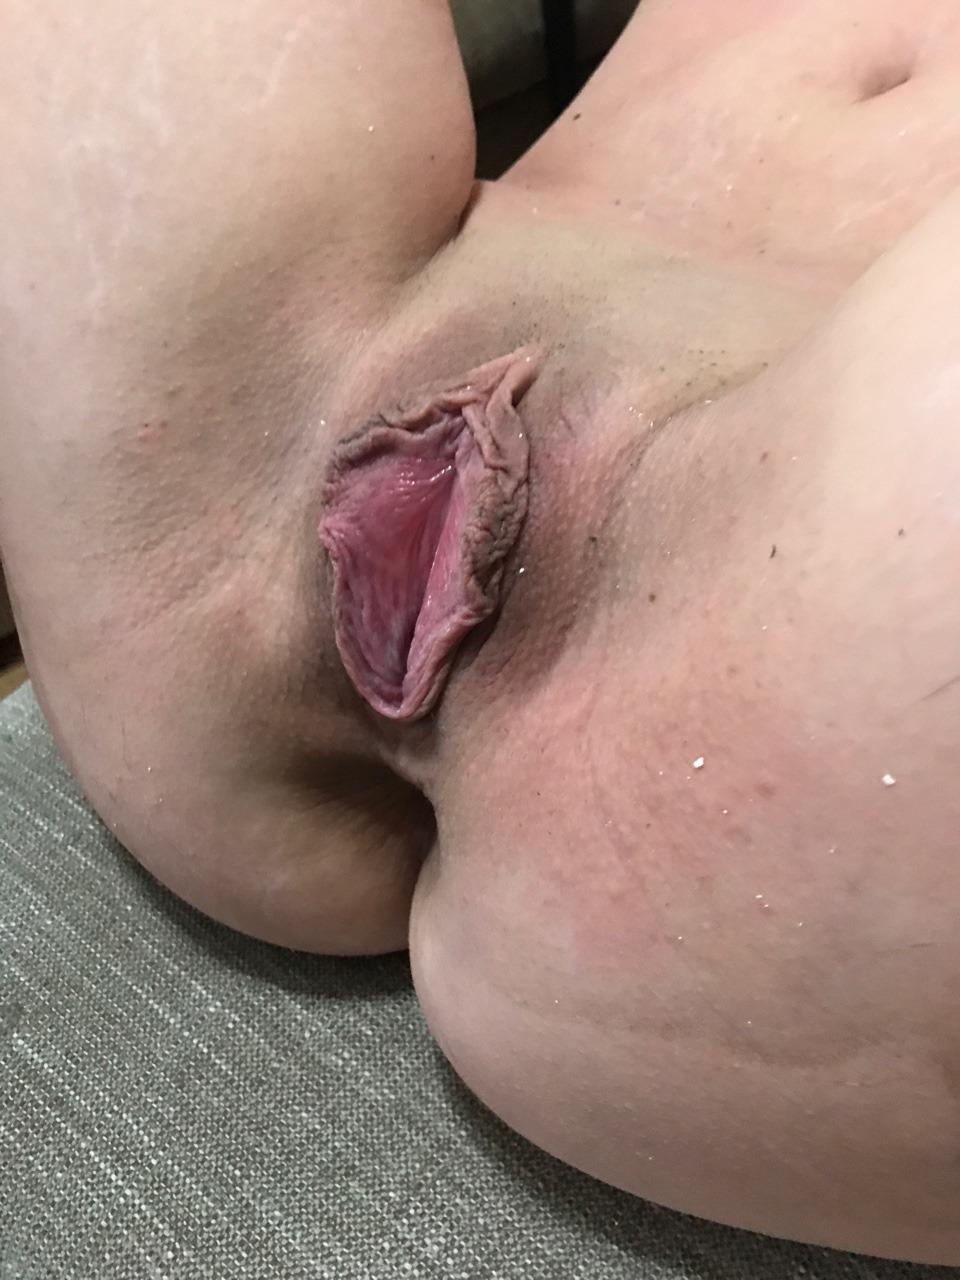 Rough Asian slut Mahiru Tsubaki takes care of her unshaven pussy photo 3